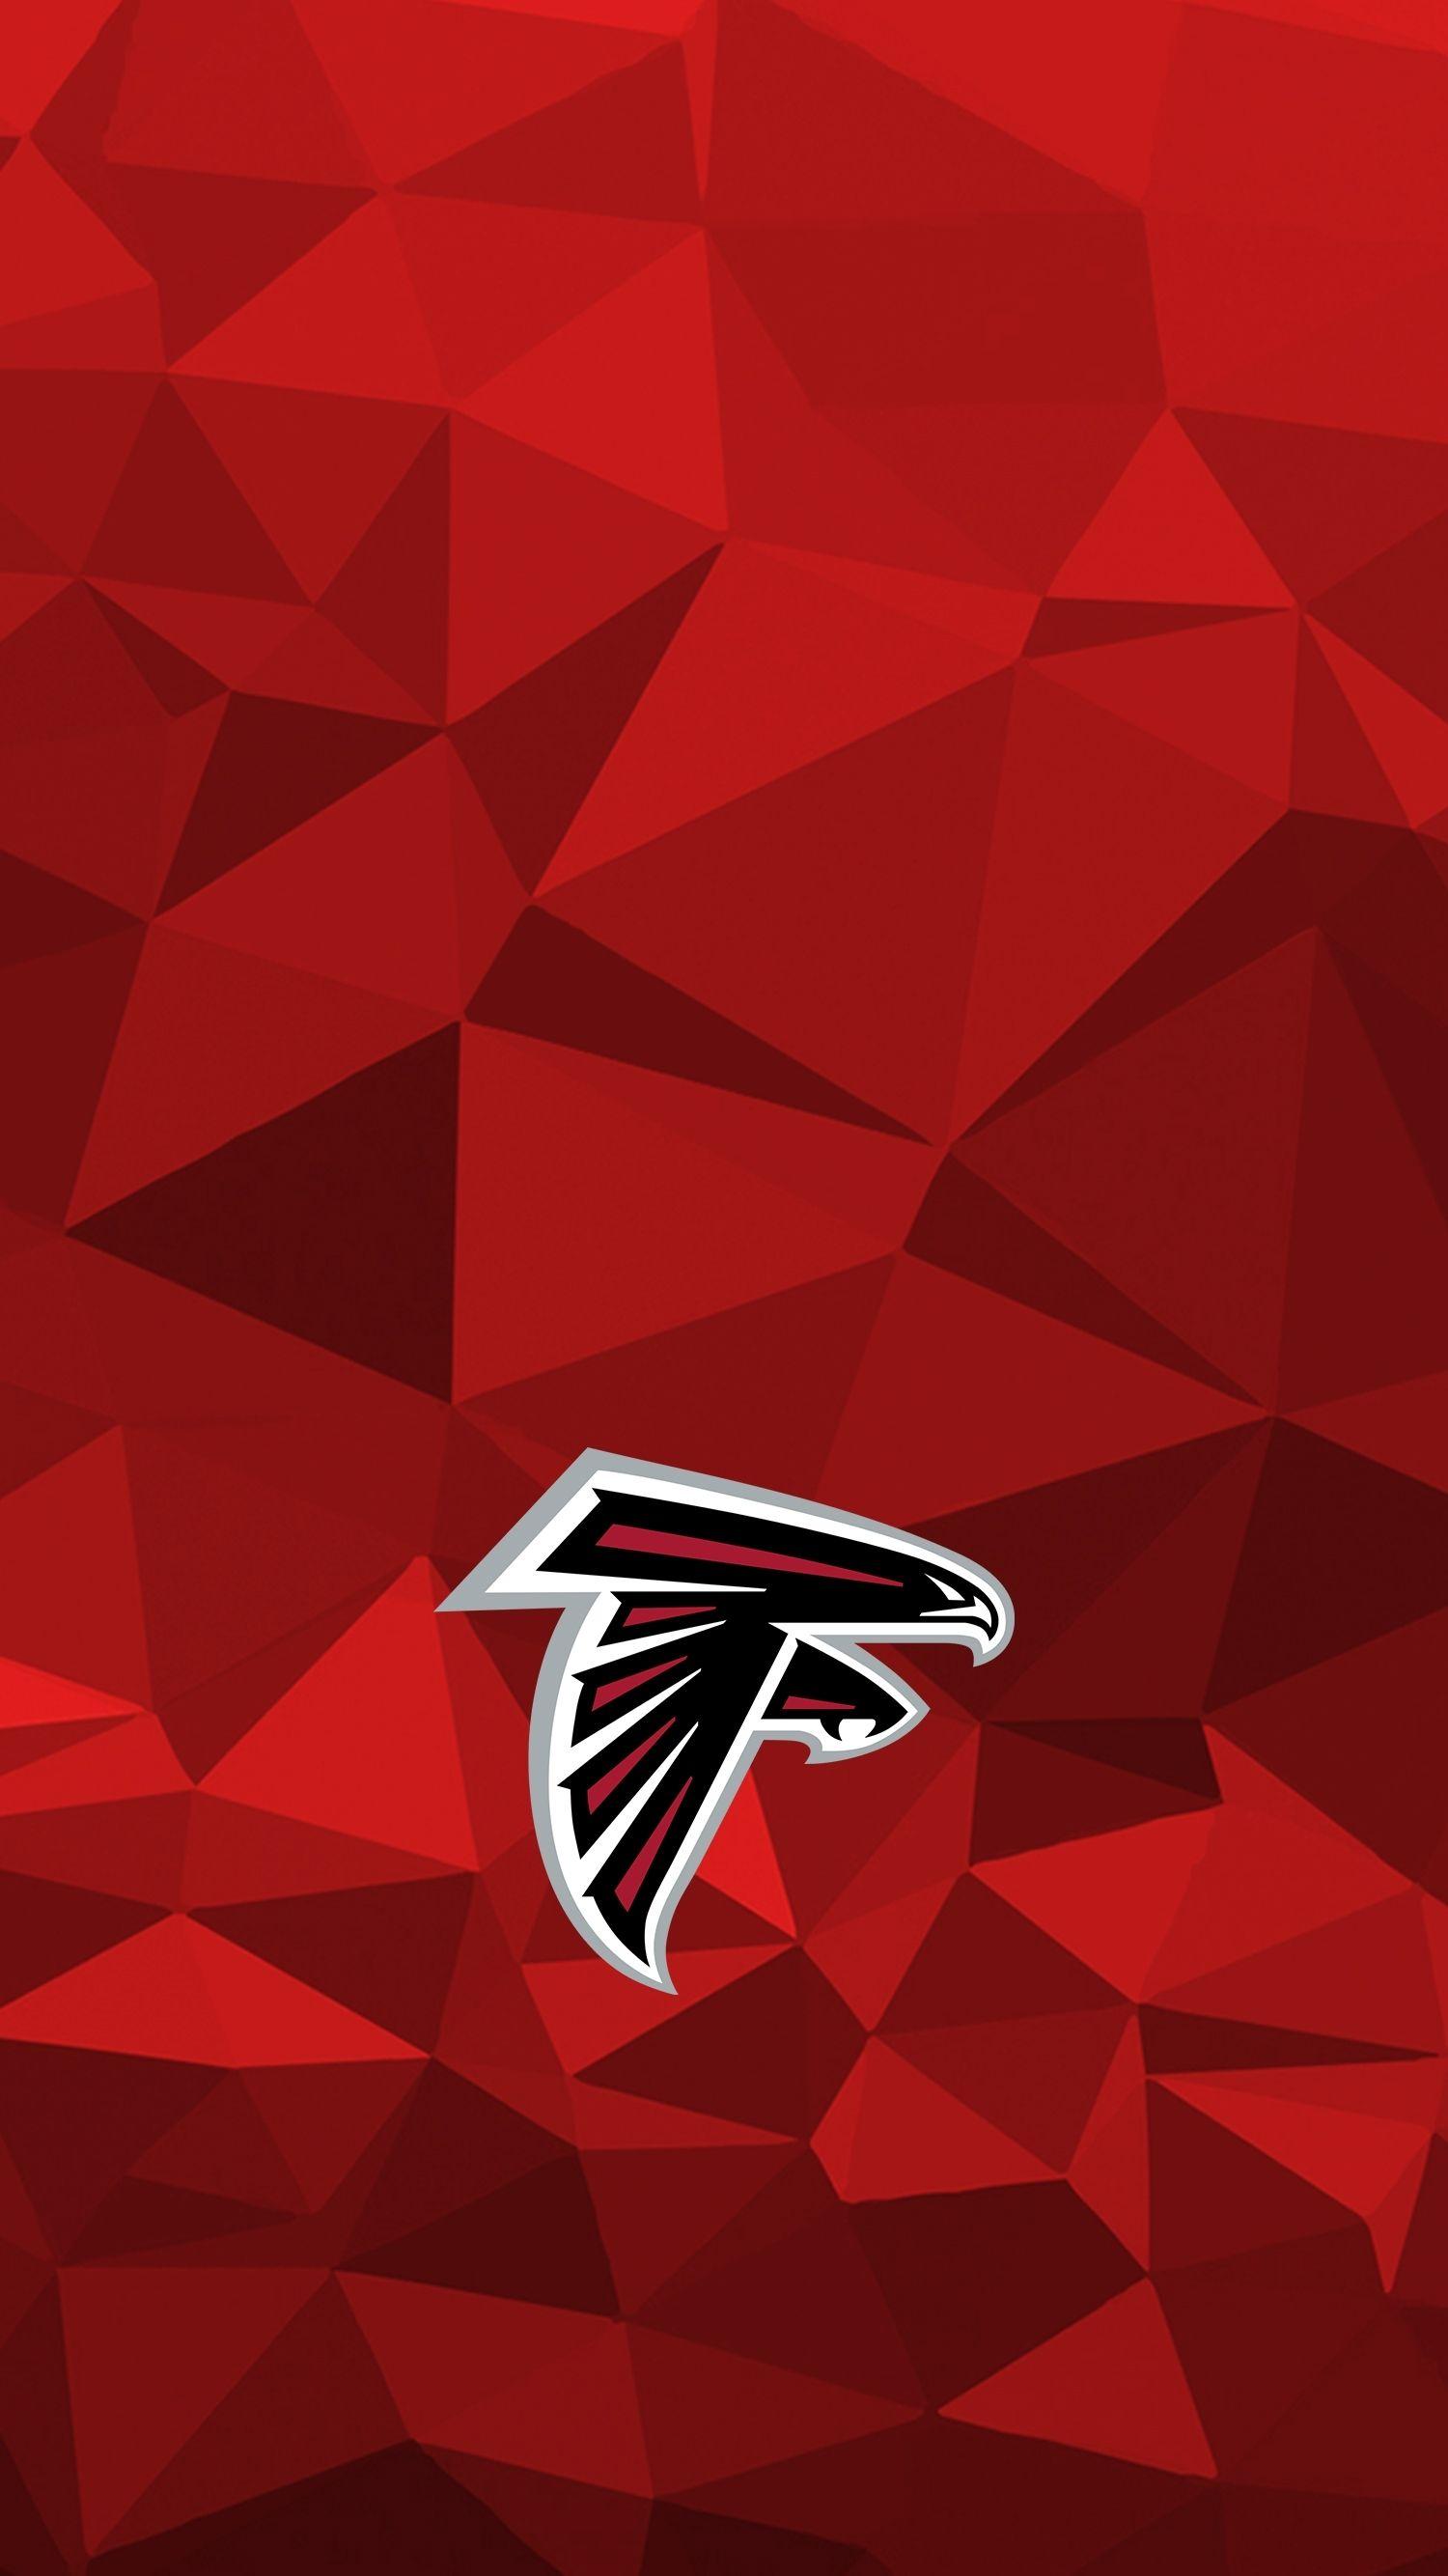 10 Latest Atlanta Falcons Wallpaper Iphone FULL HD 1080p For PC Desktop